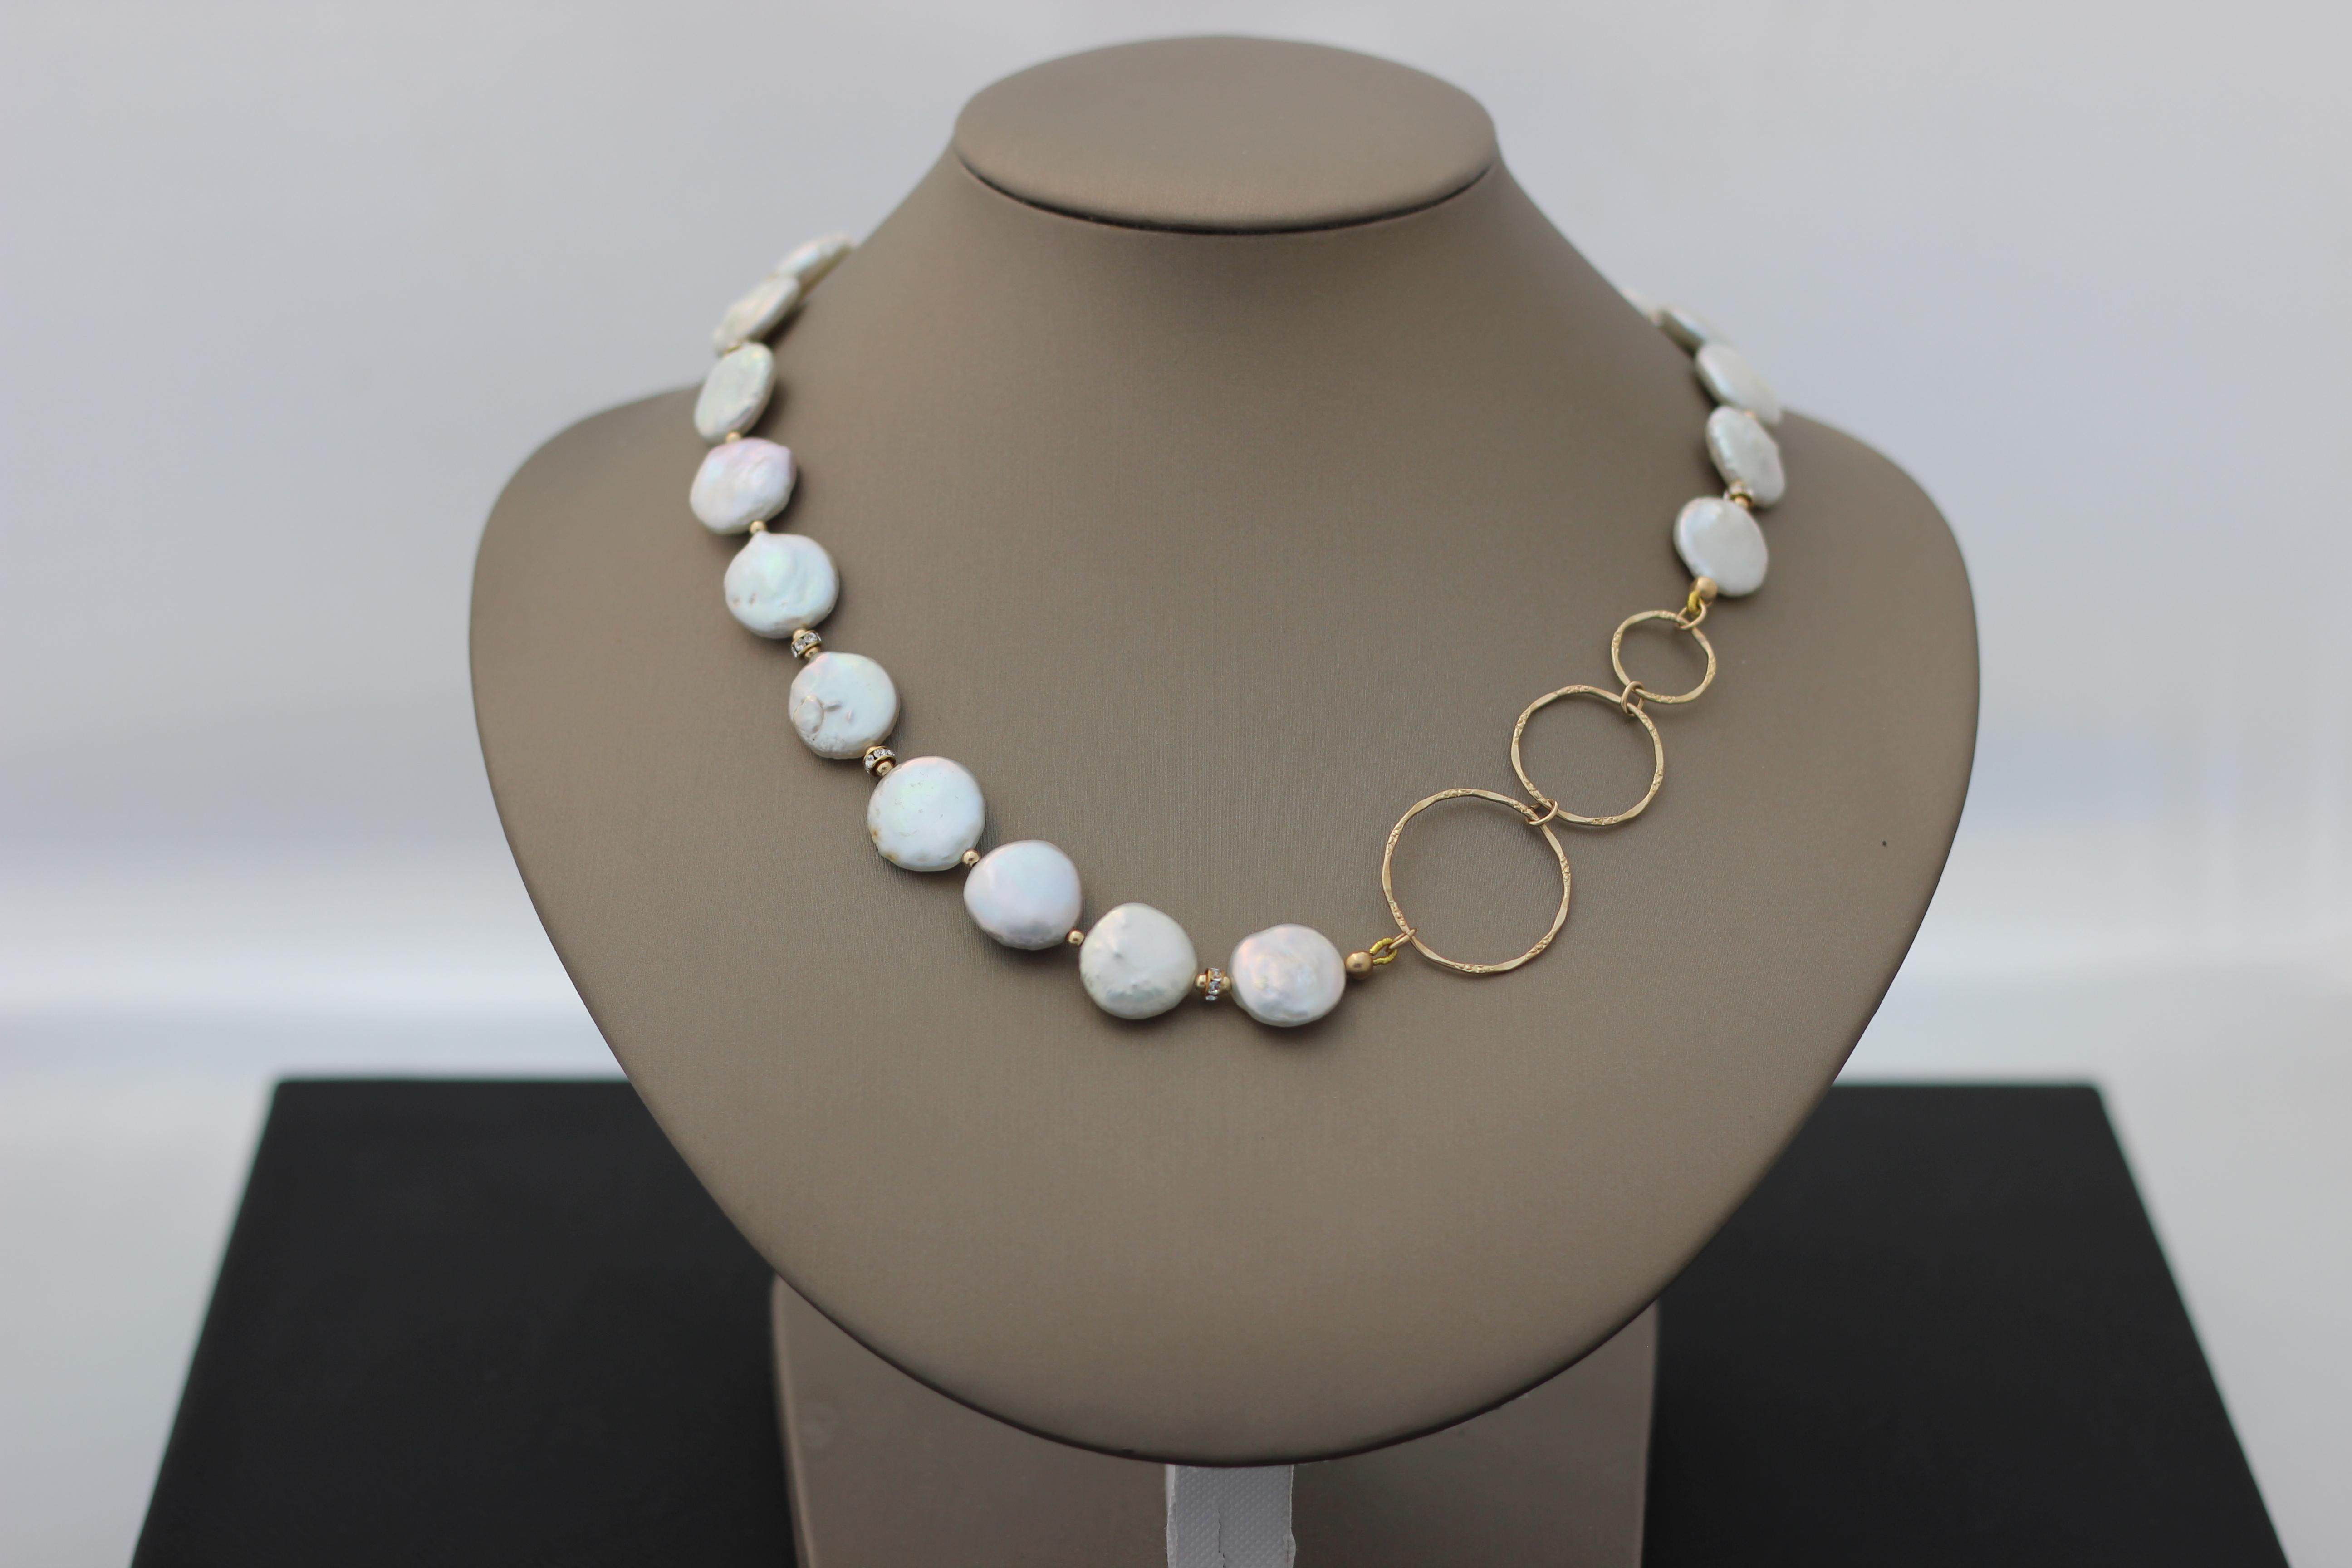 3. Biwa Pearl, Swarovski, Circles | $292